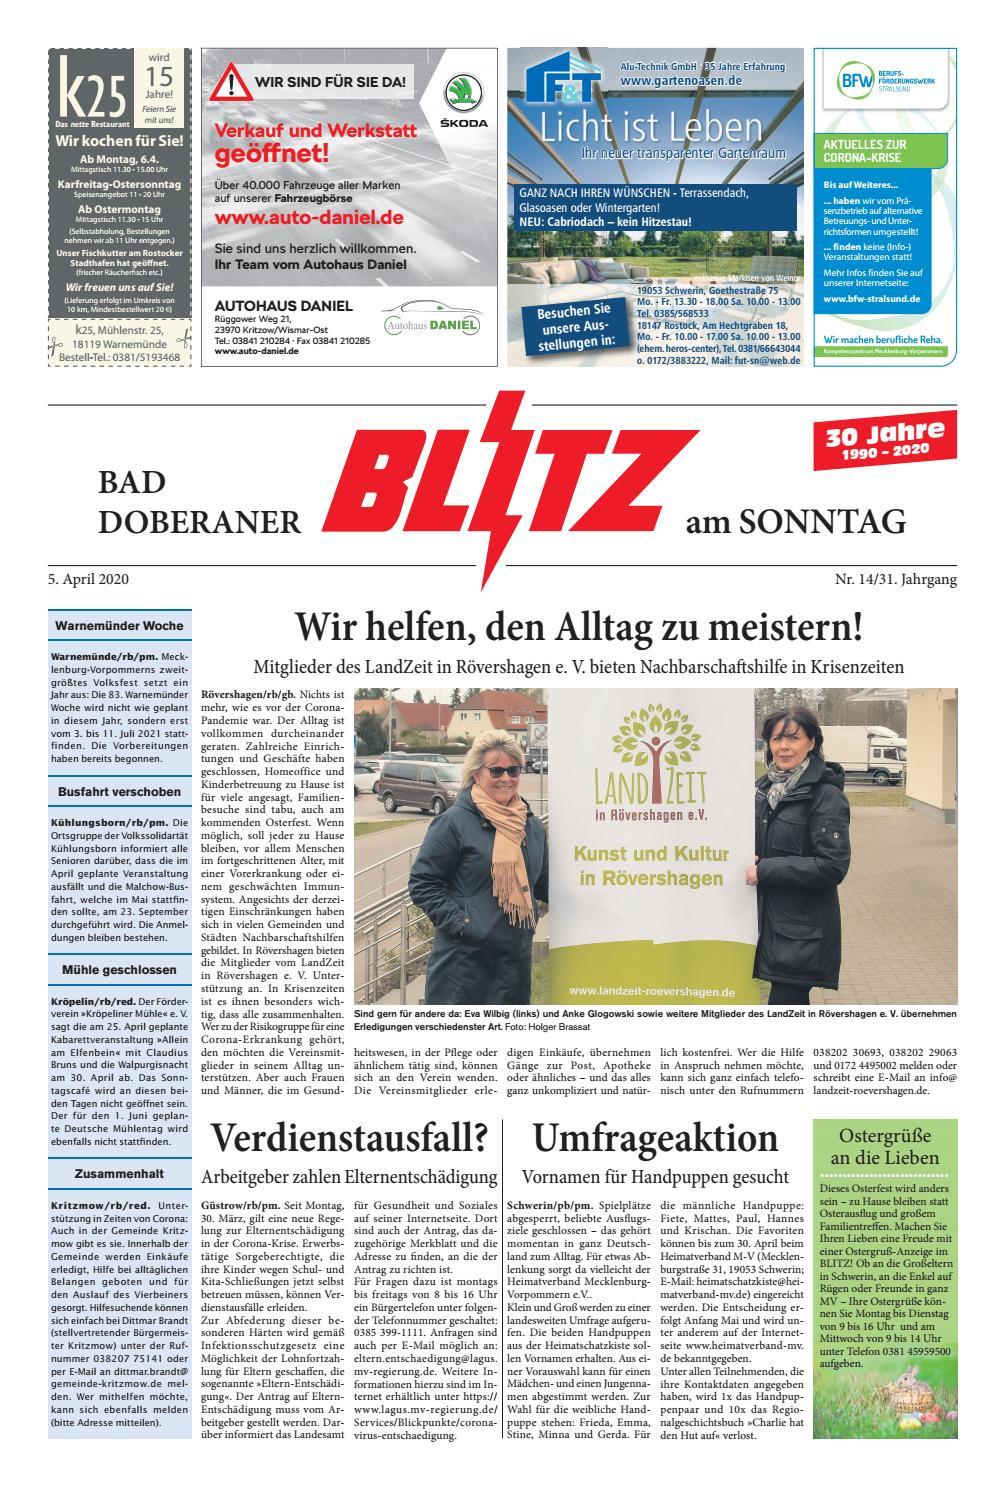 Bad Doberaner Blitz vom 21.21.21 by Blitzverlag   issuu